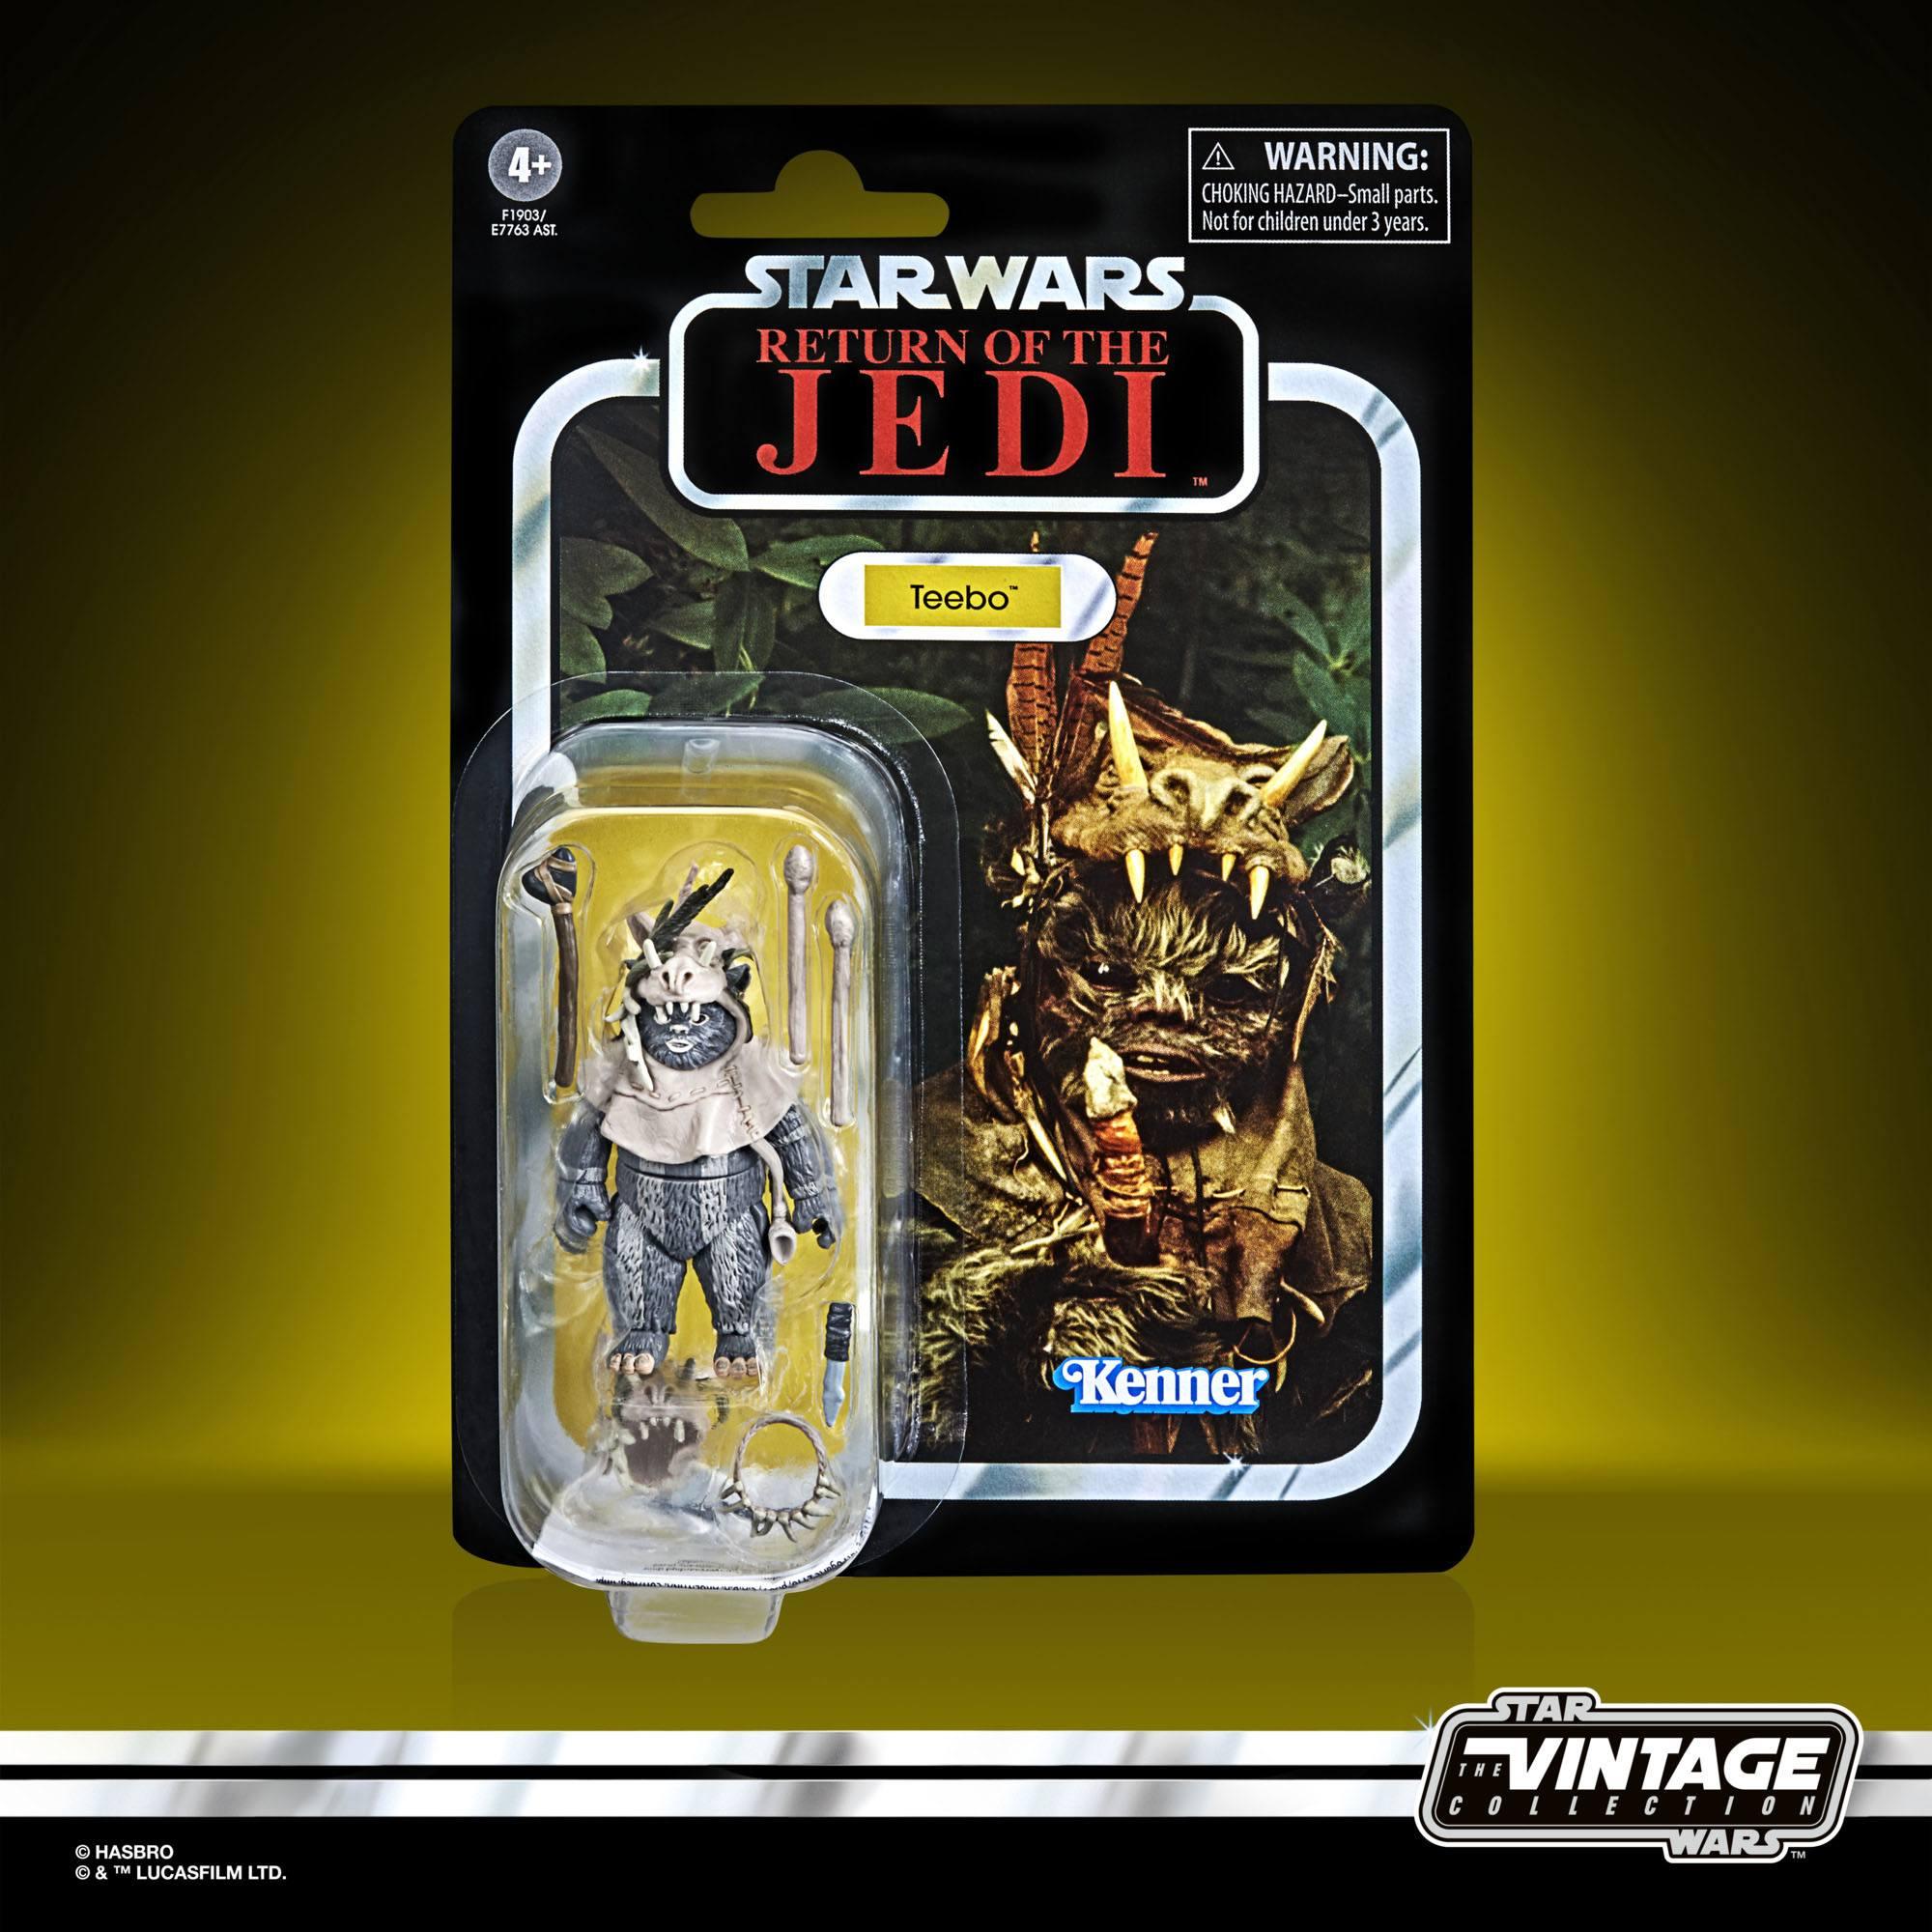 Star Wars Vintage Collection  Teebo (Episode VI) F19035L00 5010993866342